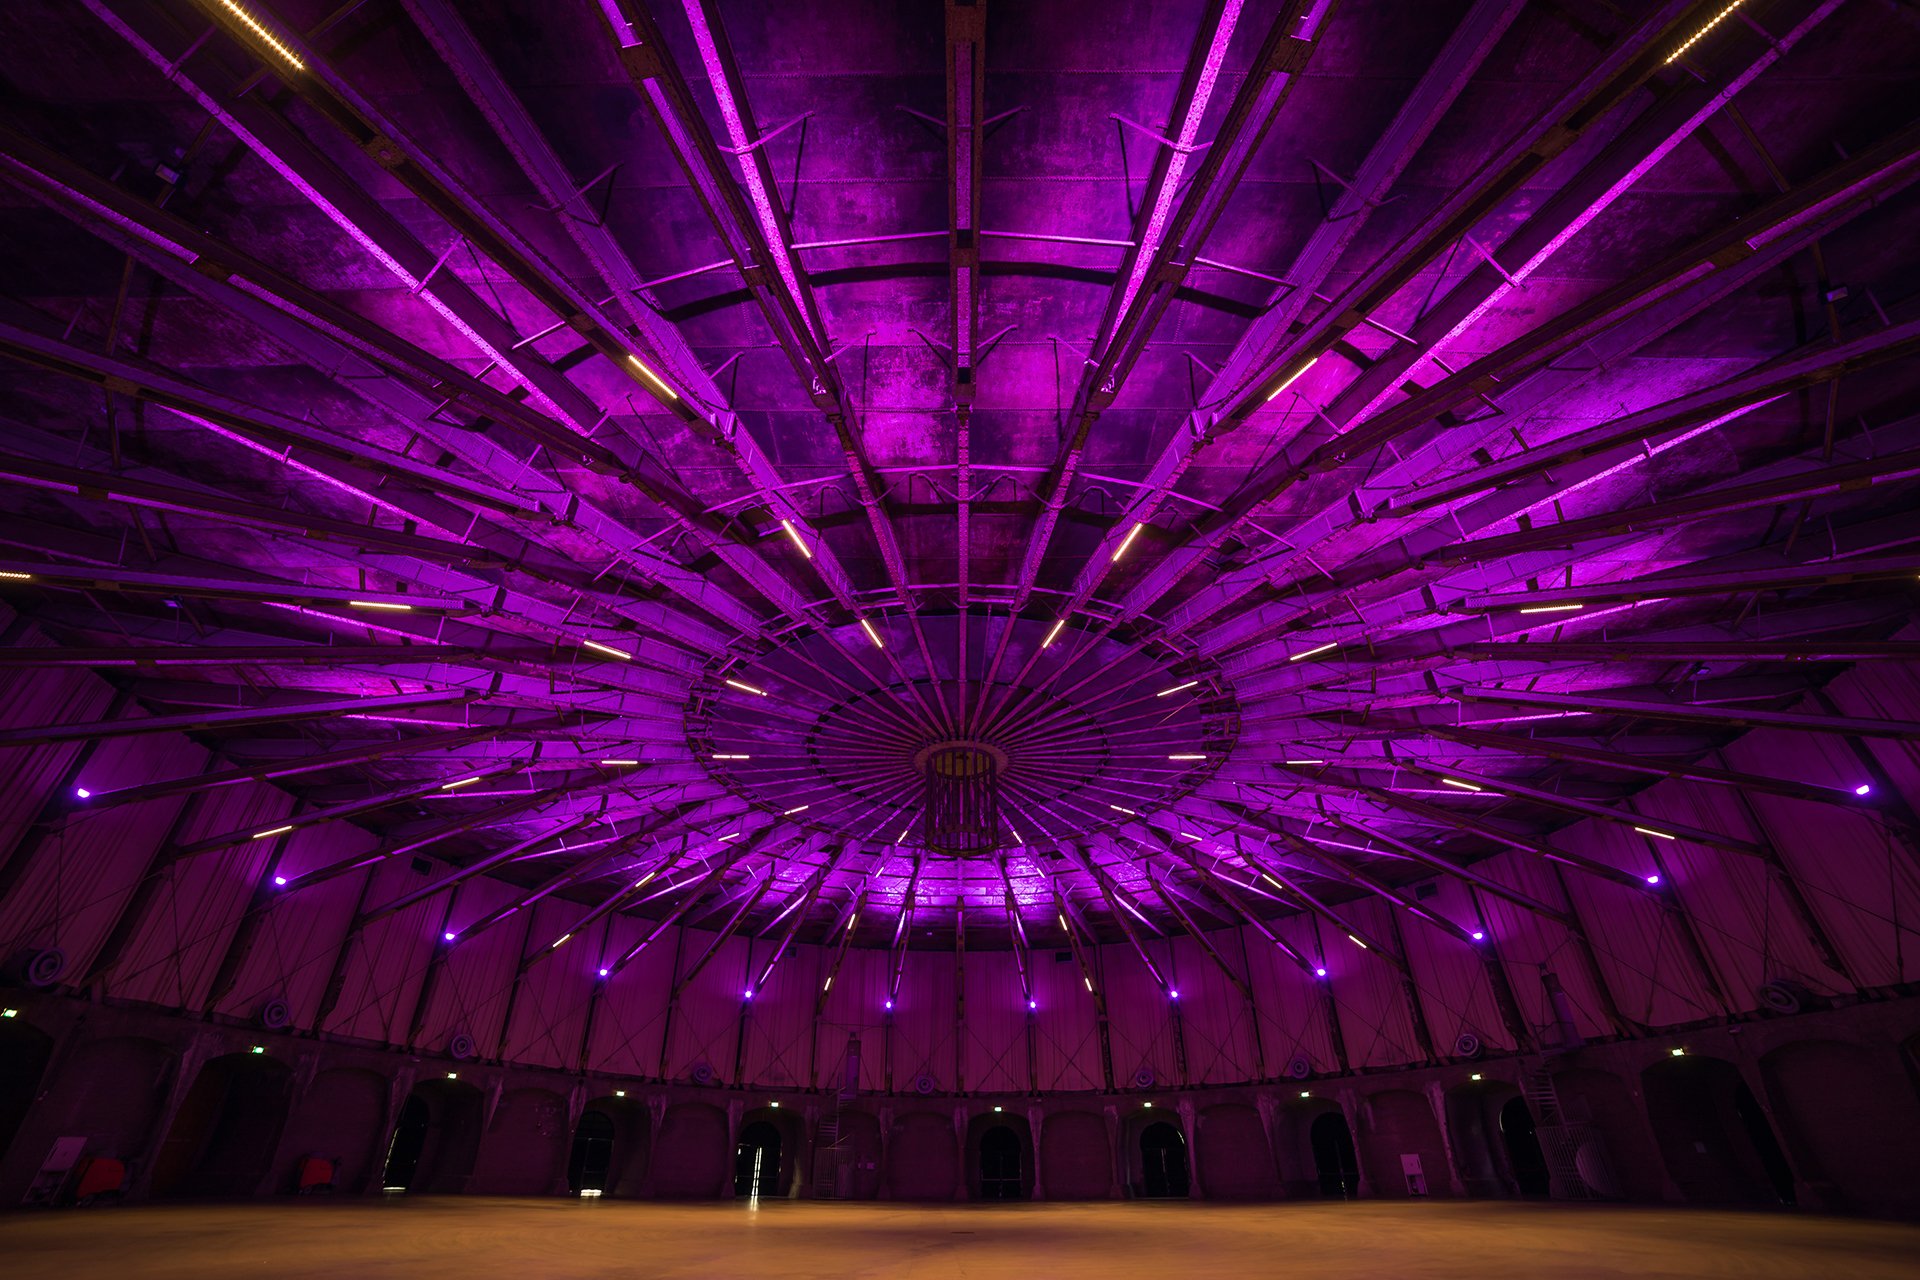 Fairlight installeert LED verlichting in Gashouder